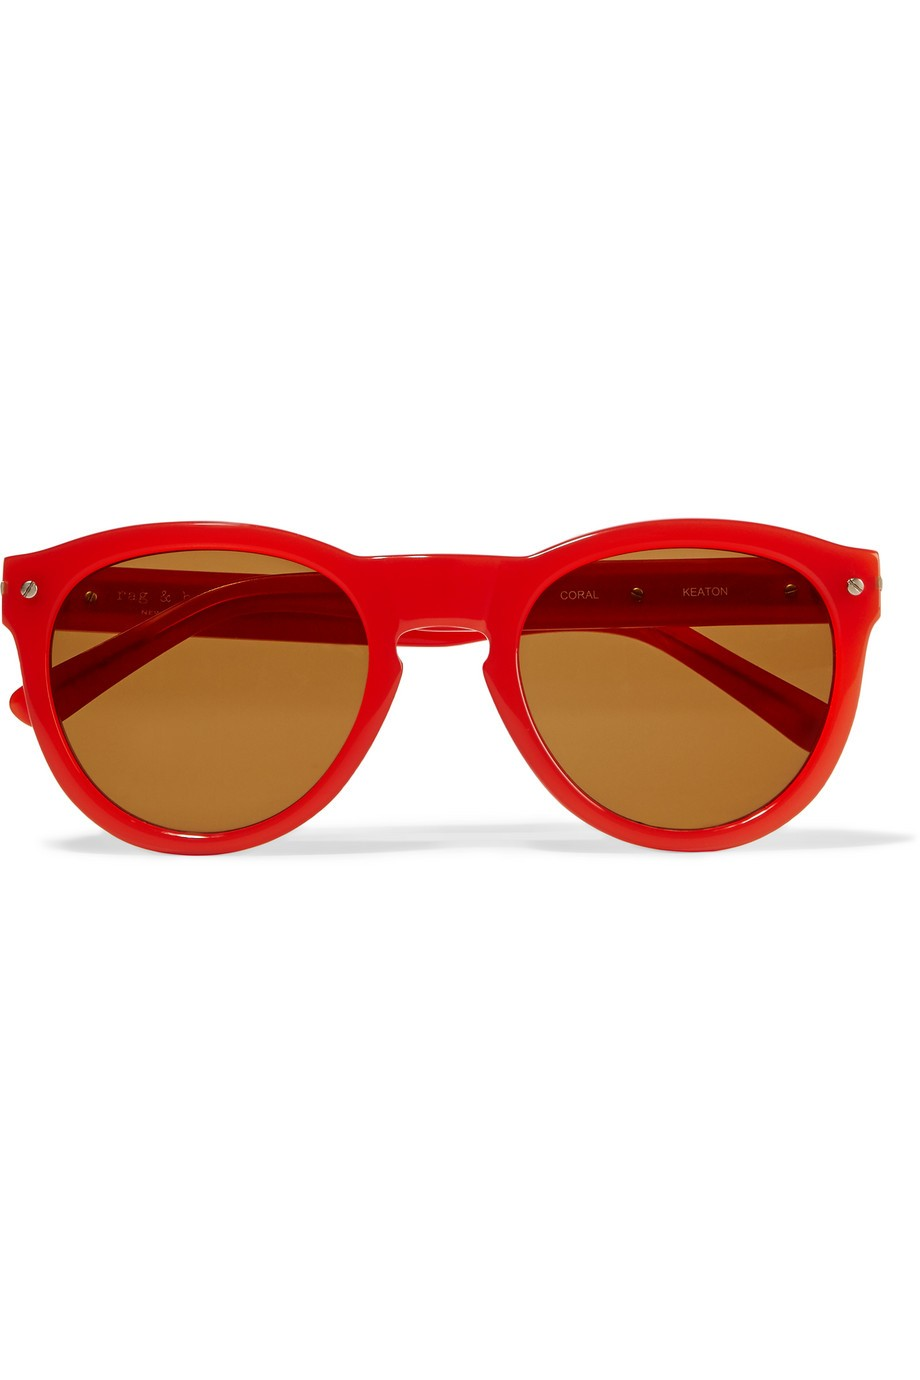 Keaton round-frame acetate sunglasses